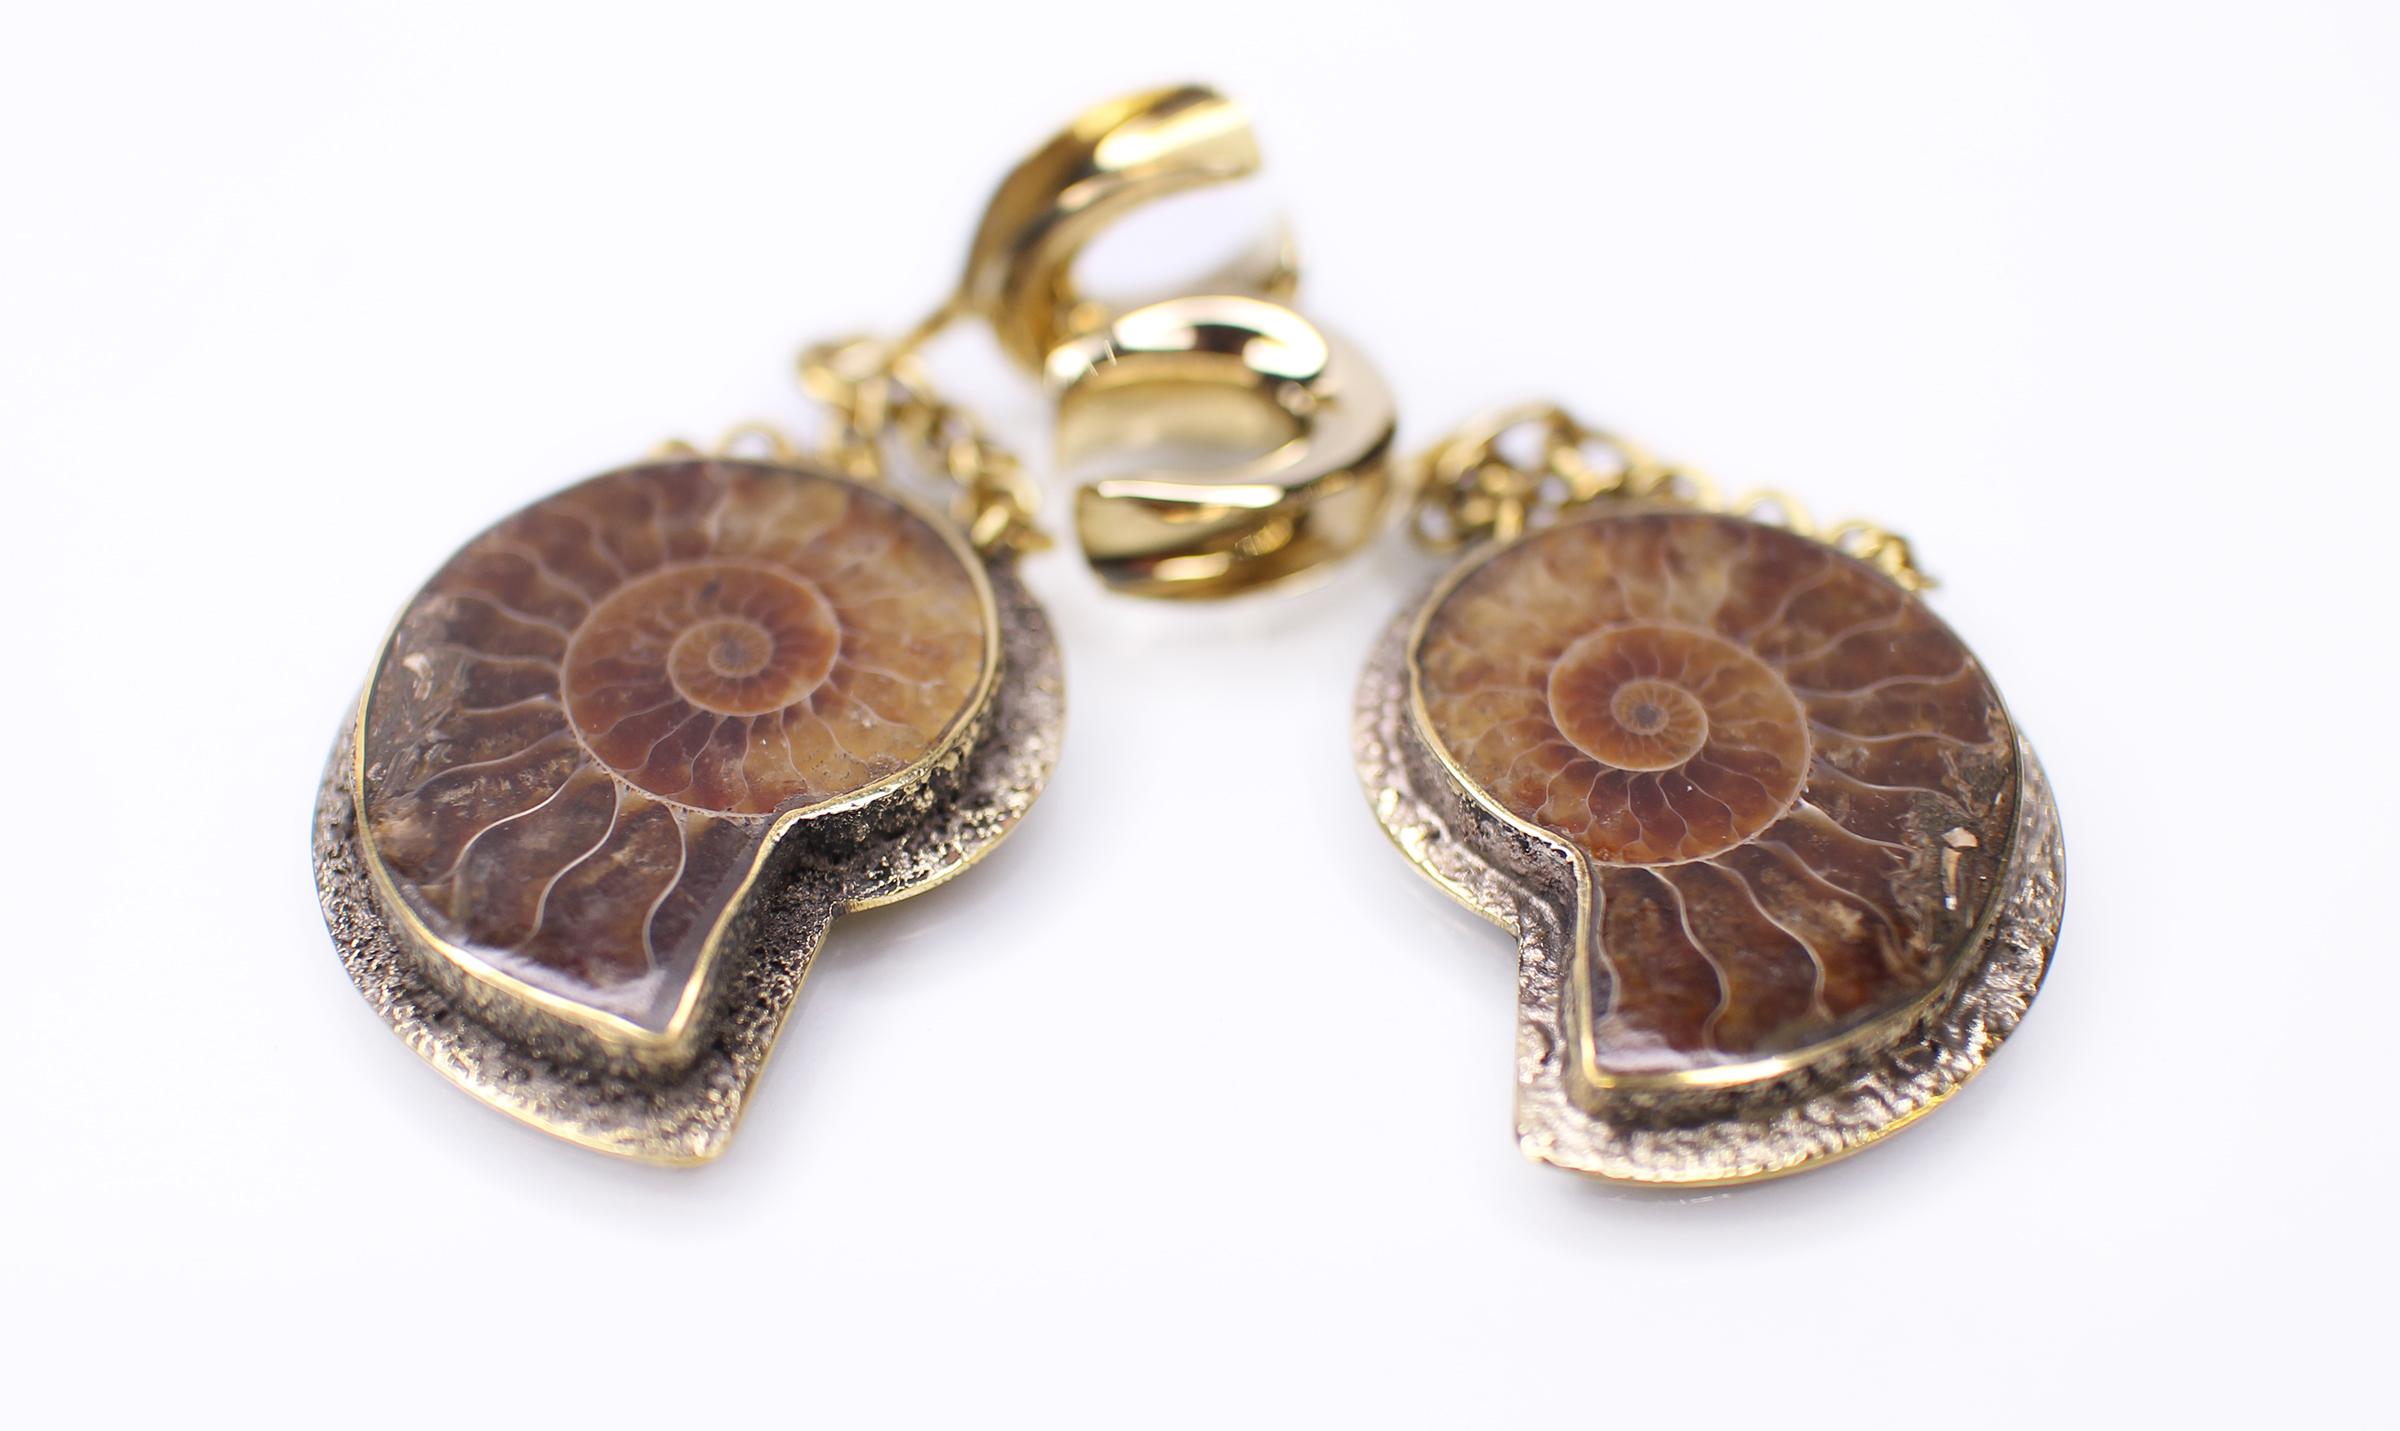 Jewelry IMG_9350 Diablo Ammonites.jpg